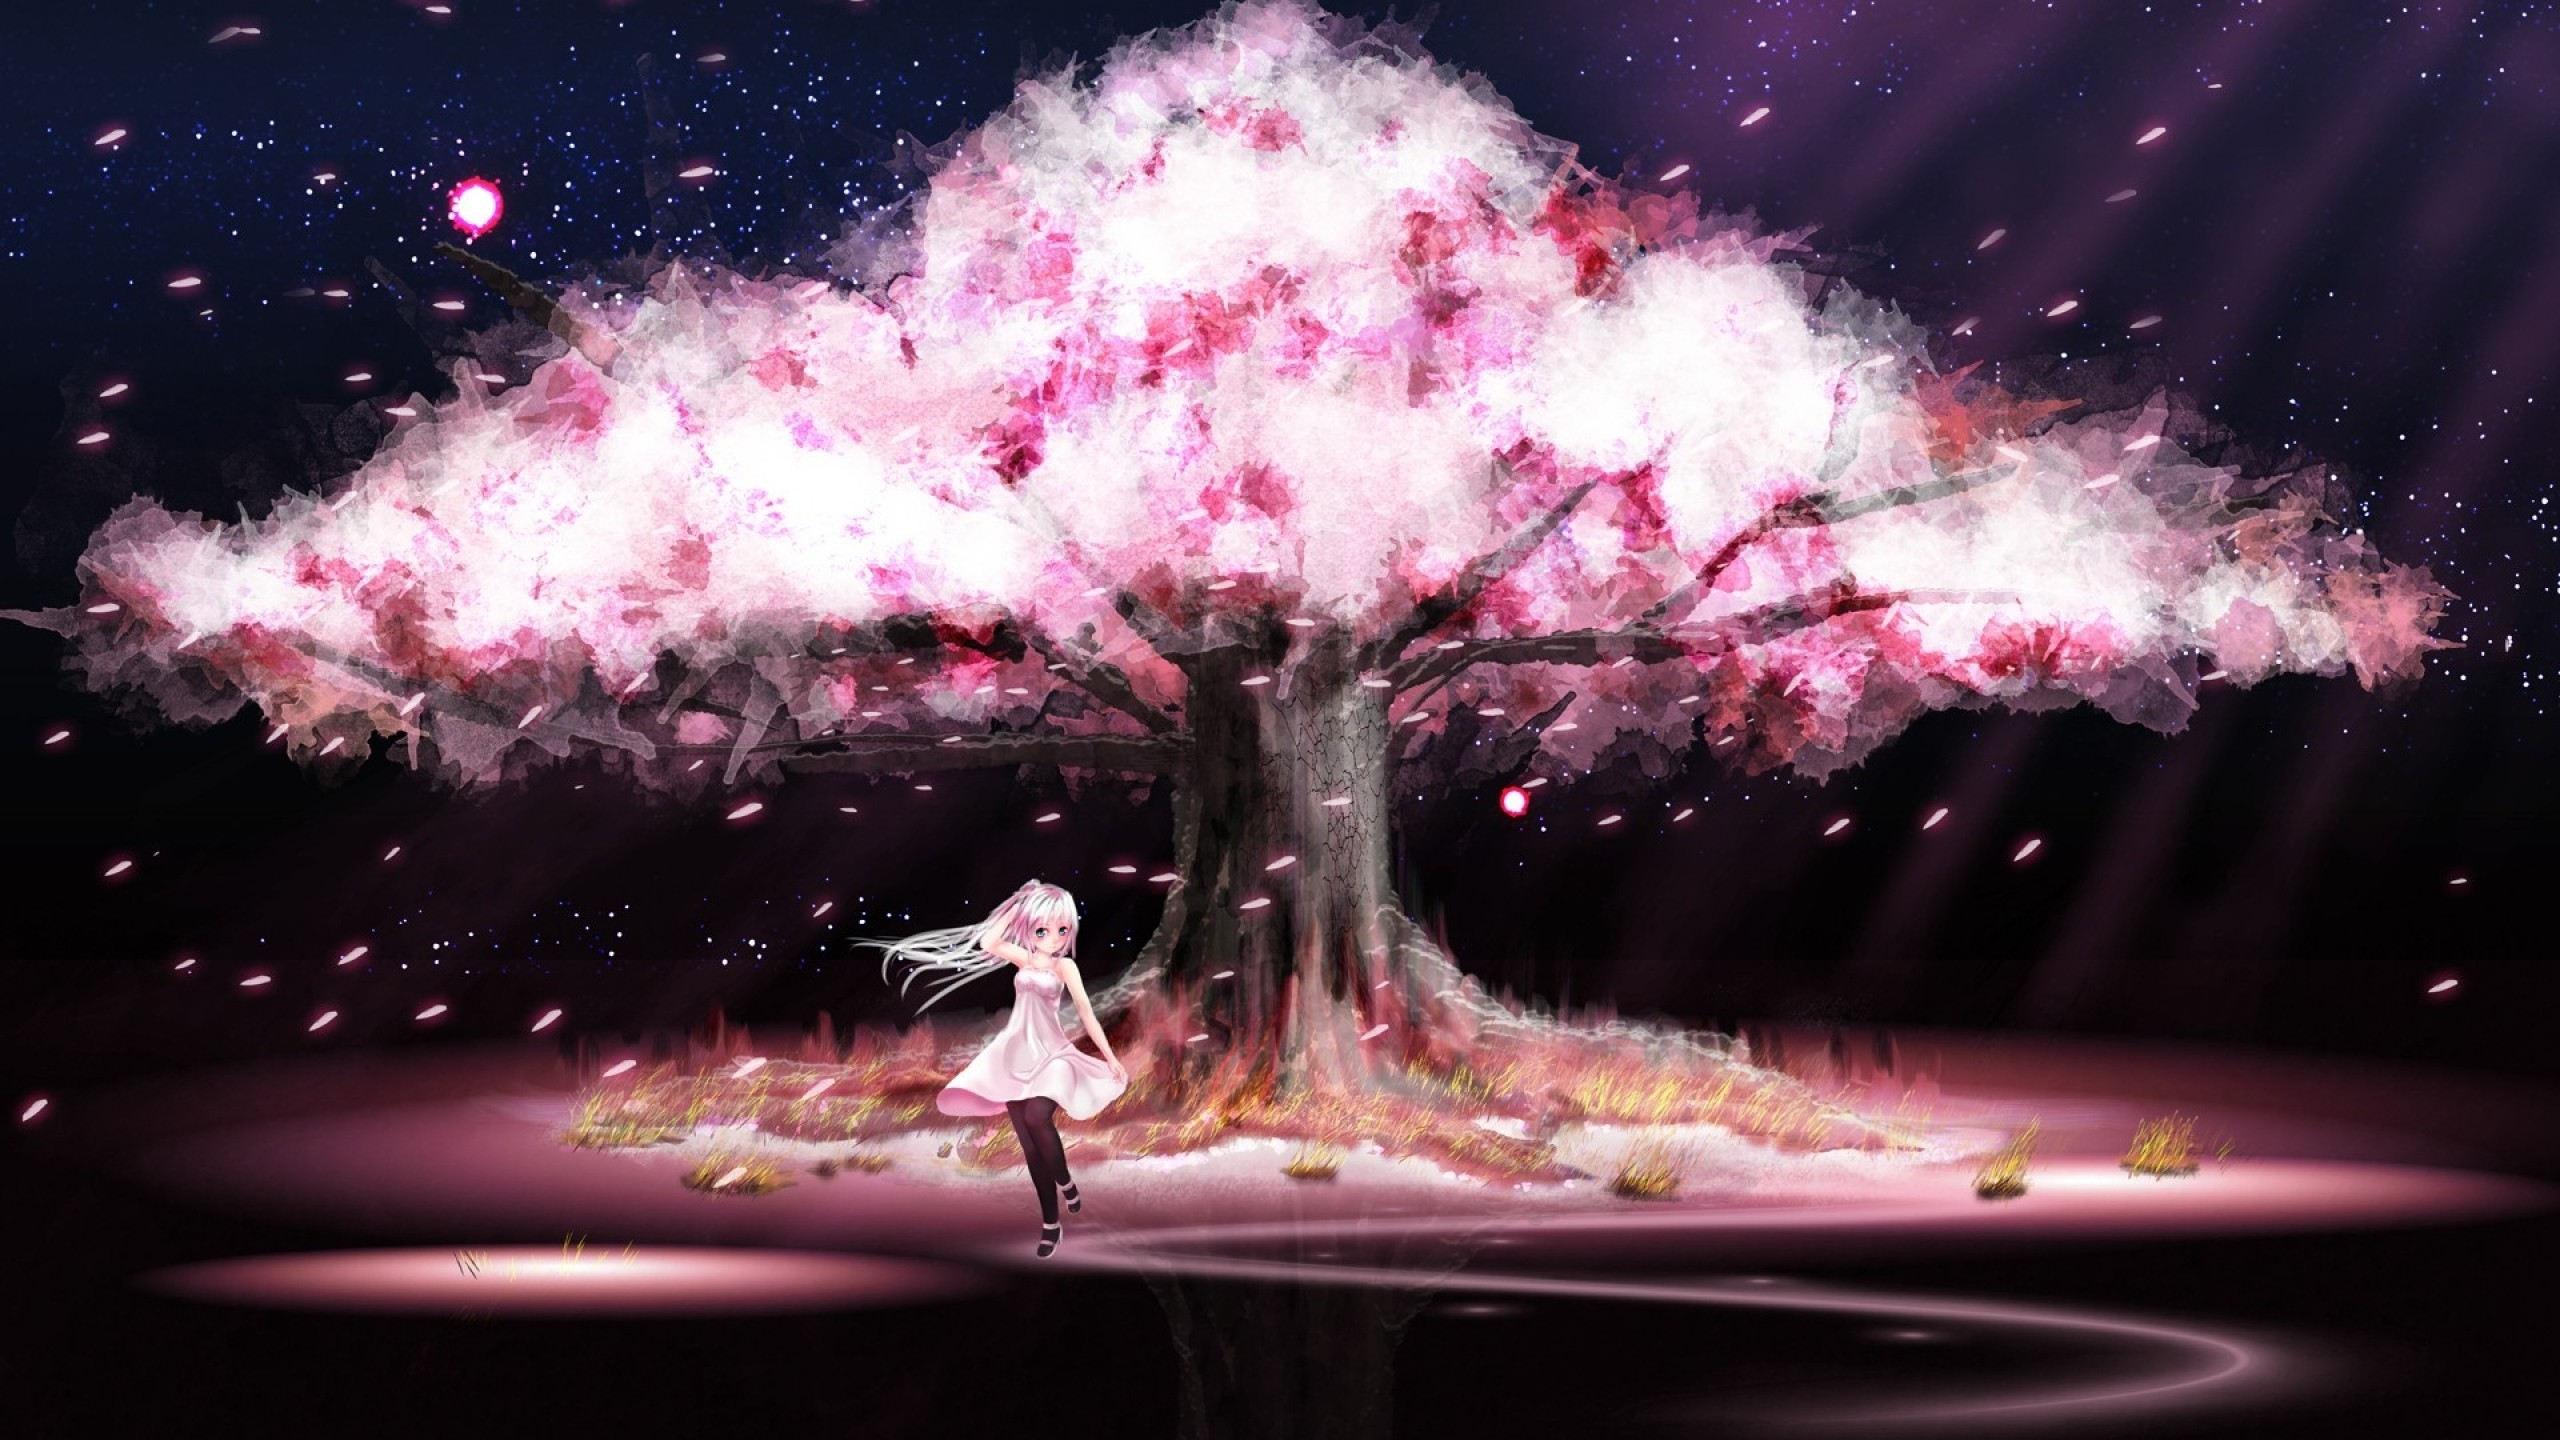 wallpaper.wiki-Anime-Cherry-Blossom-Wallpaper-PIC-WPC004901